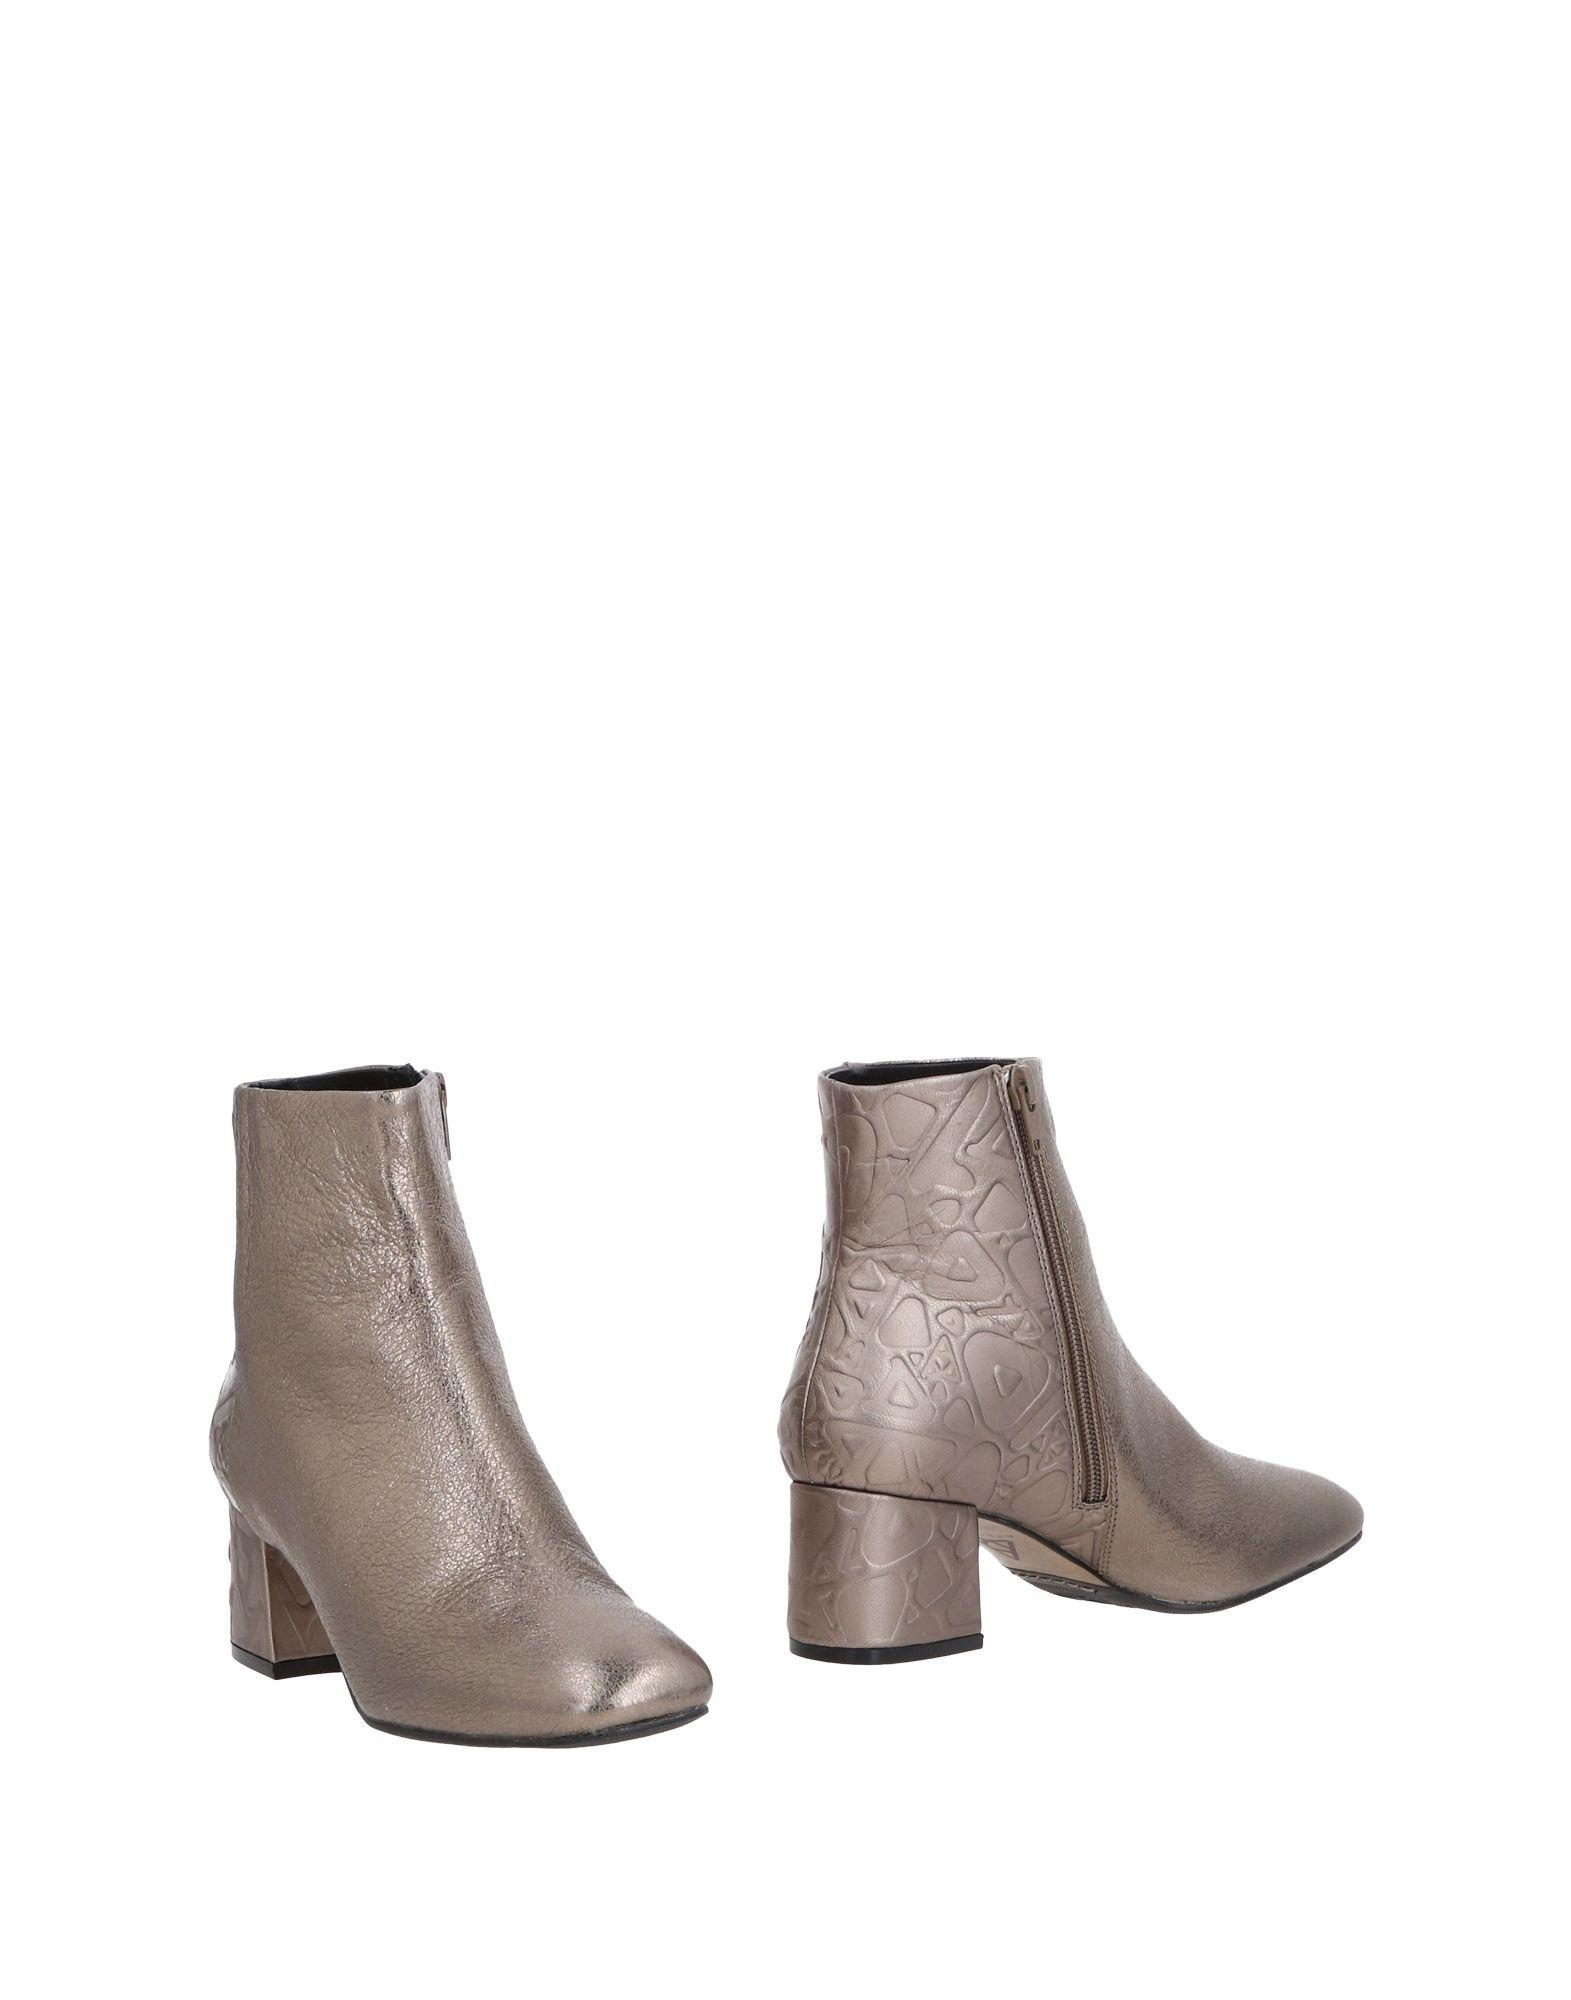 Apepazza Ankle Boot - Women Apepazza Apepazza Women Ankle Boots online on  United Kingdom - 11467346NB 261ffa